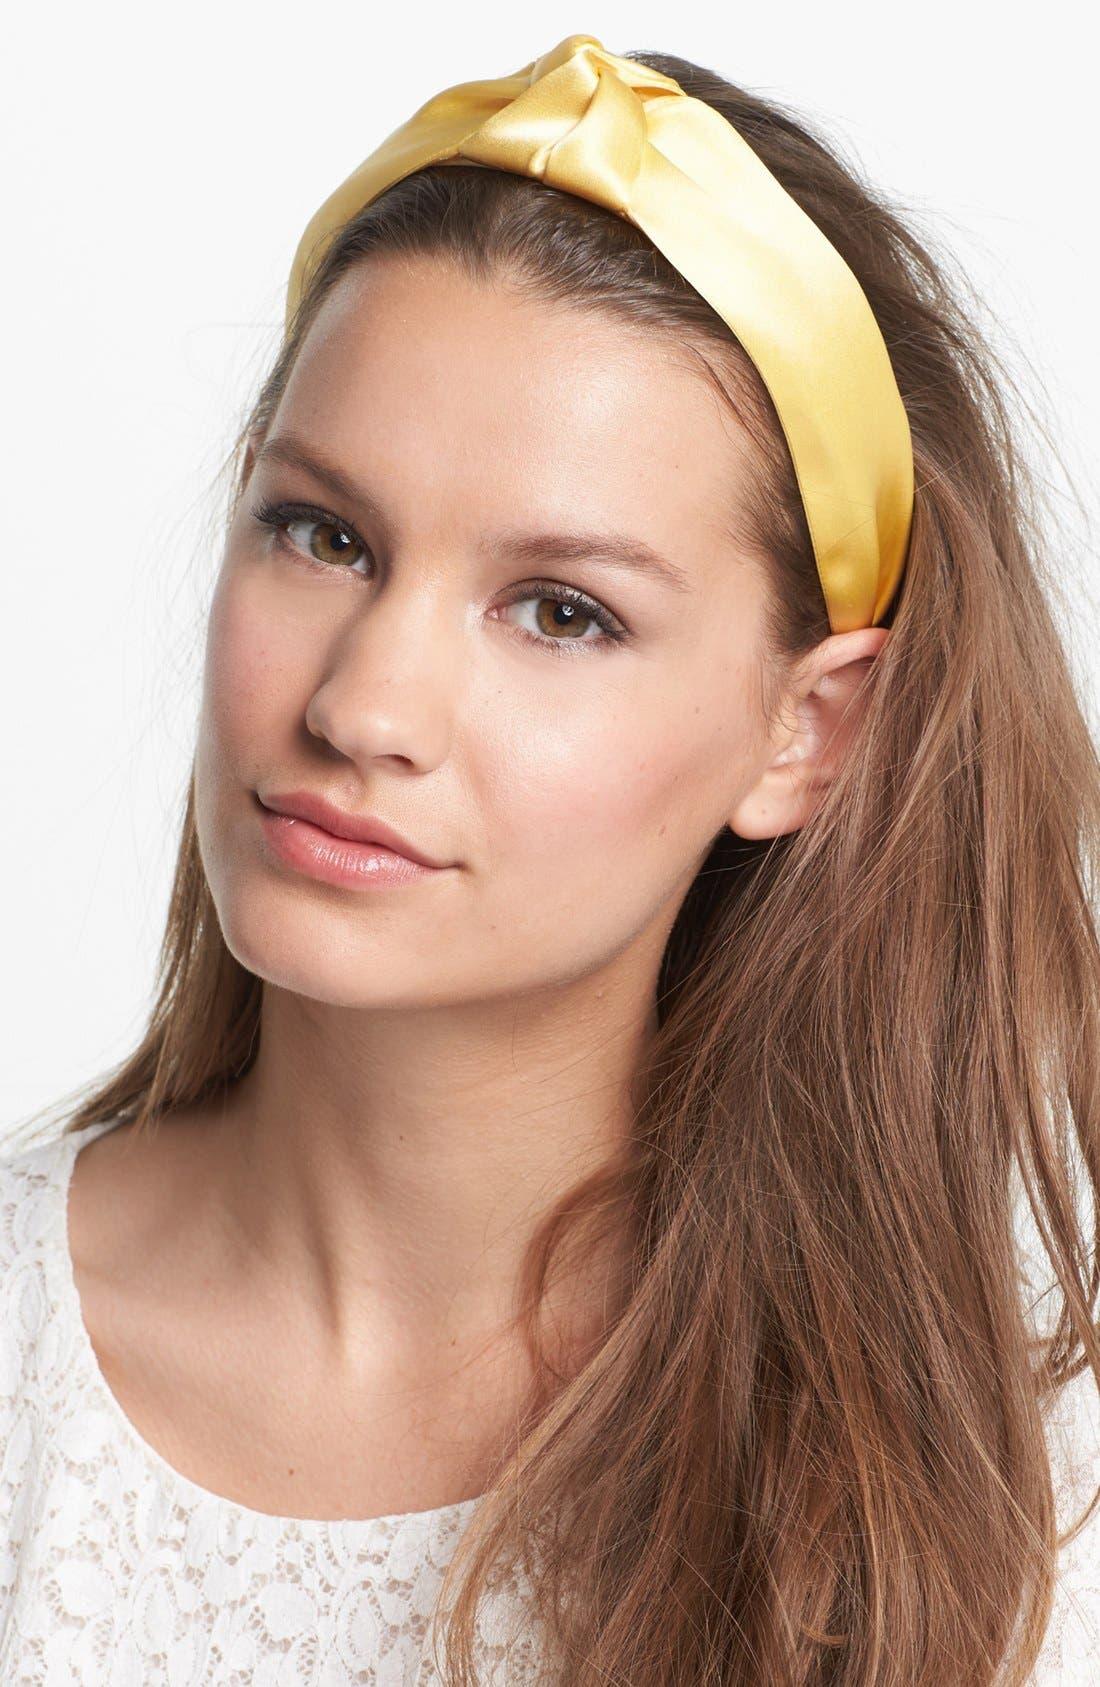 Alternate Image 1 Selected - L. Erickson 'Narrow Knot' Turban Headband